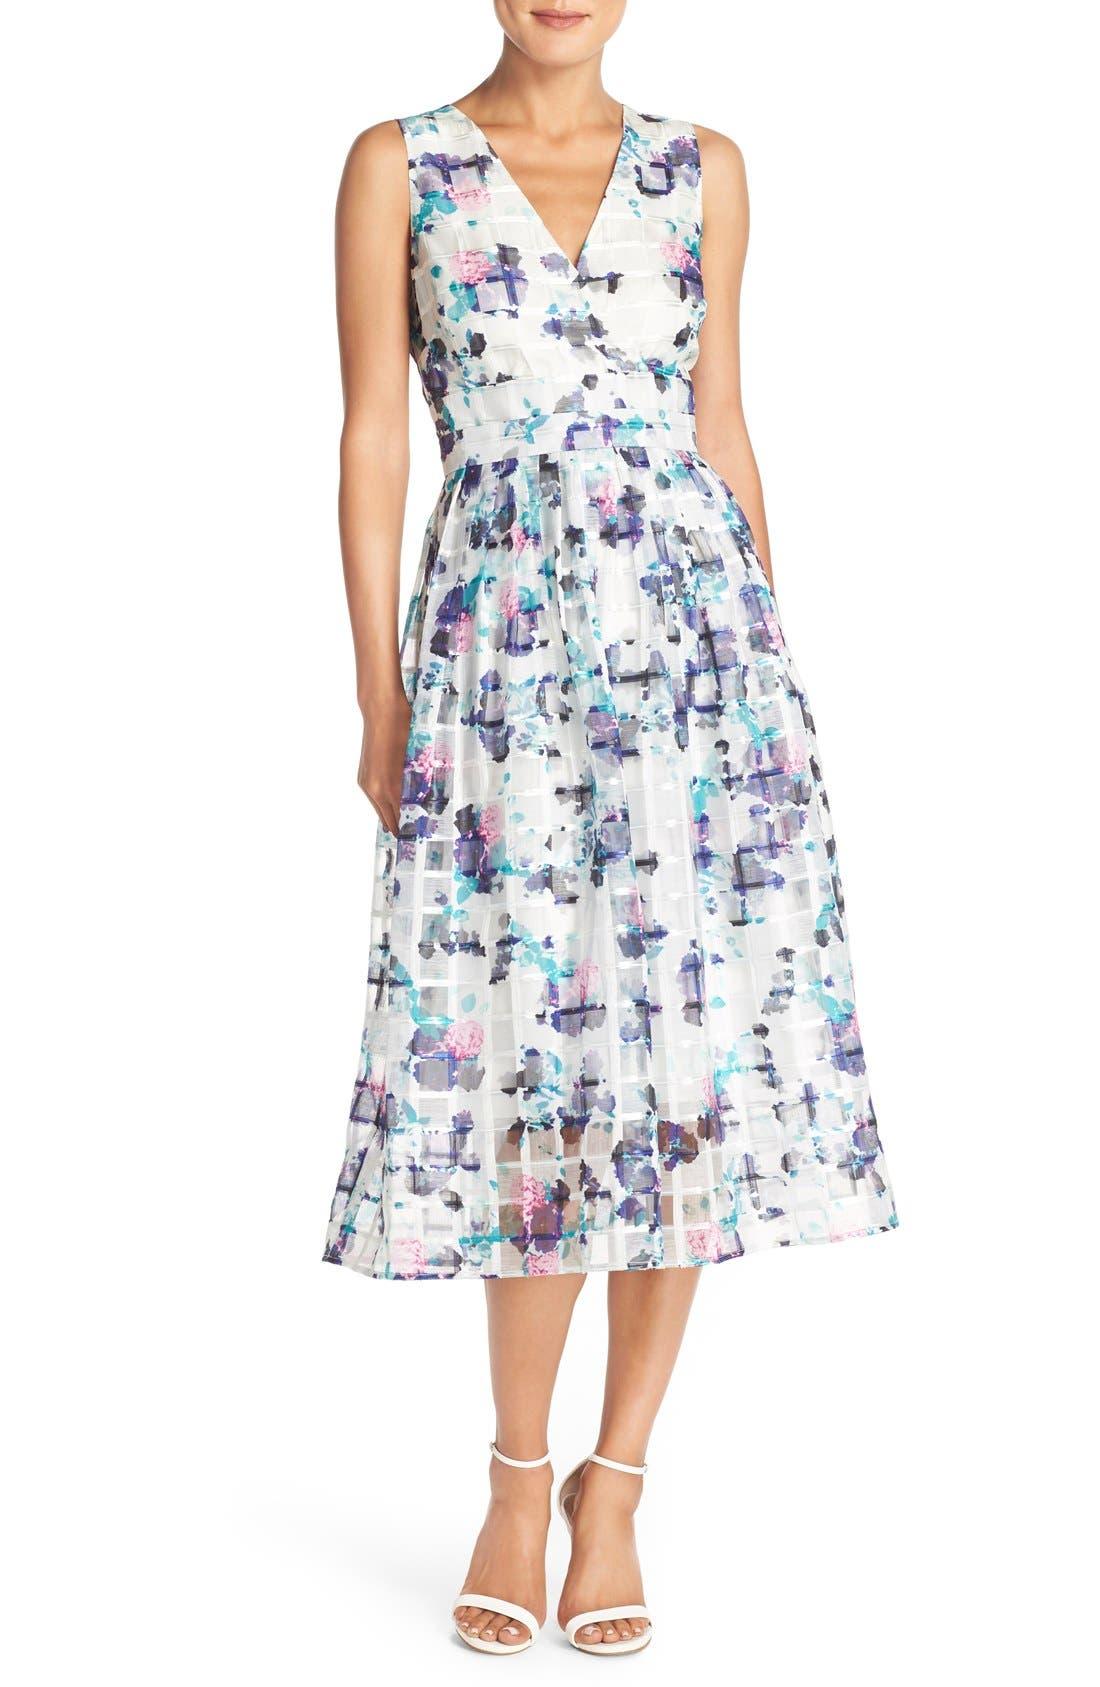 Alternate Image 1 Selected - Ivanka Trump Floral Print Organza Midi Dress